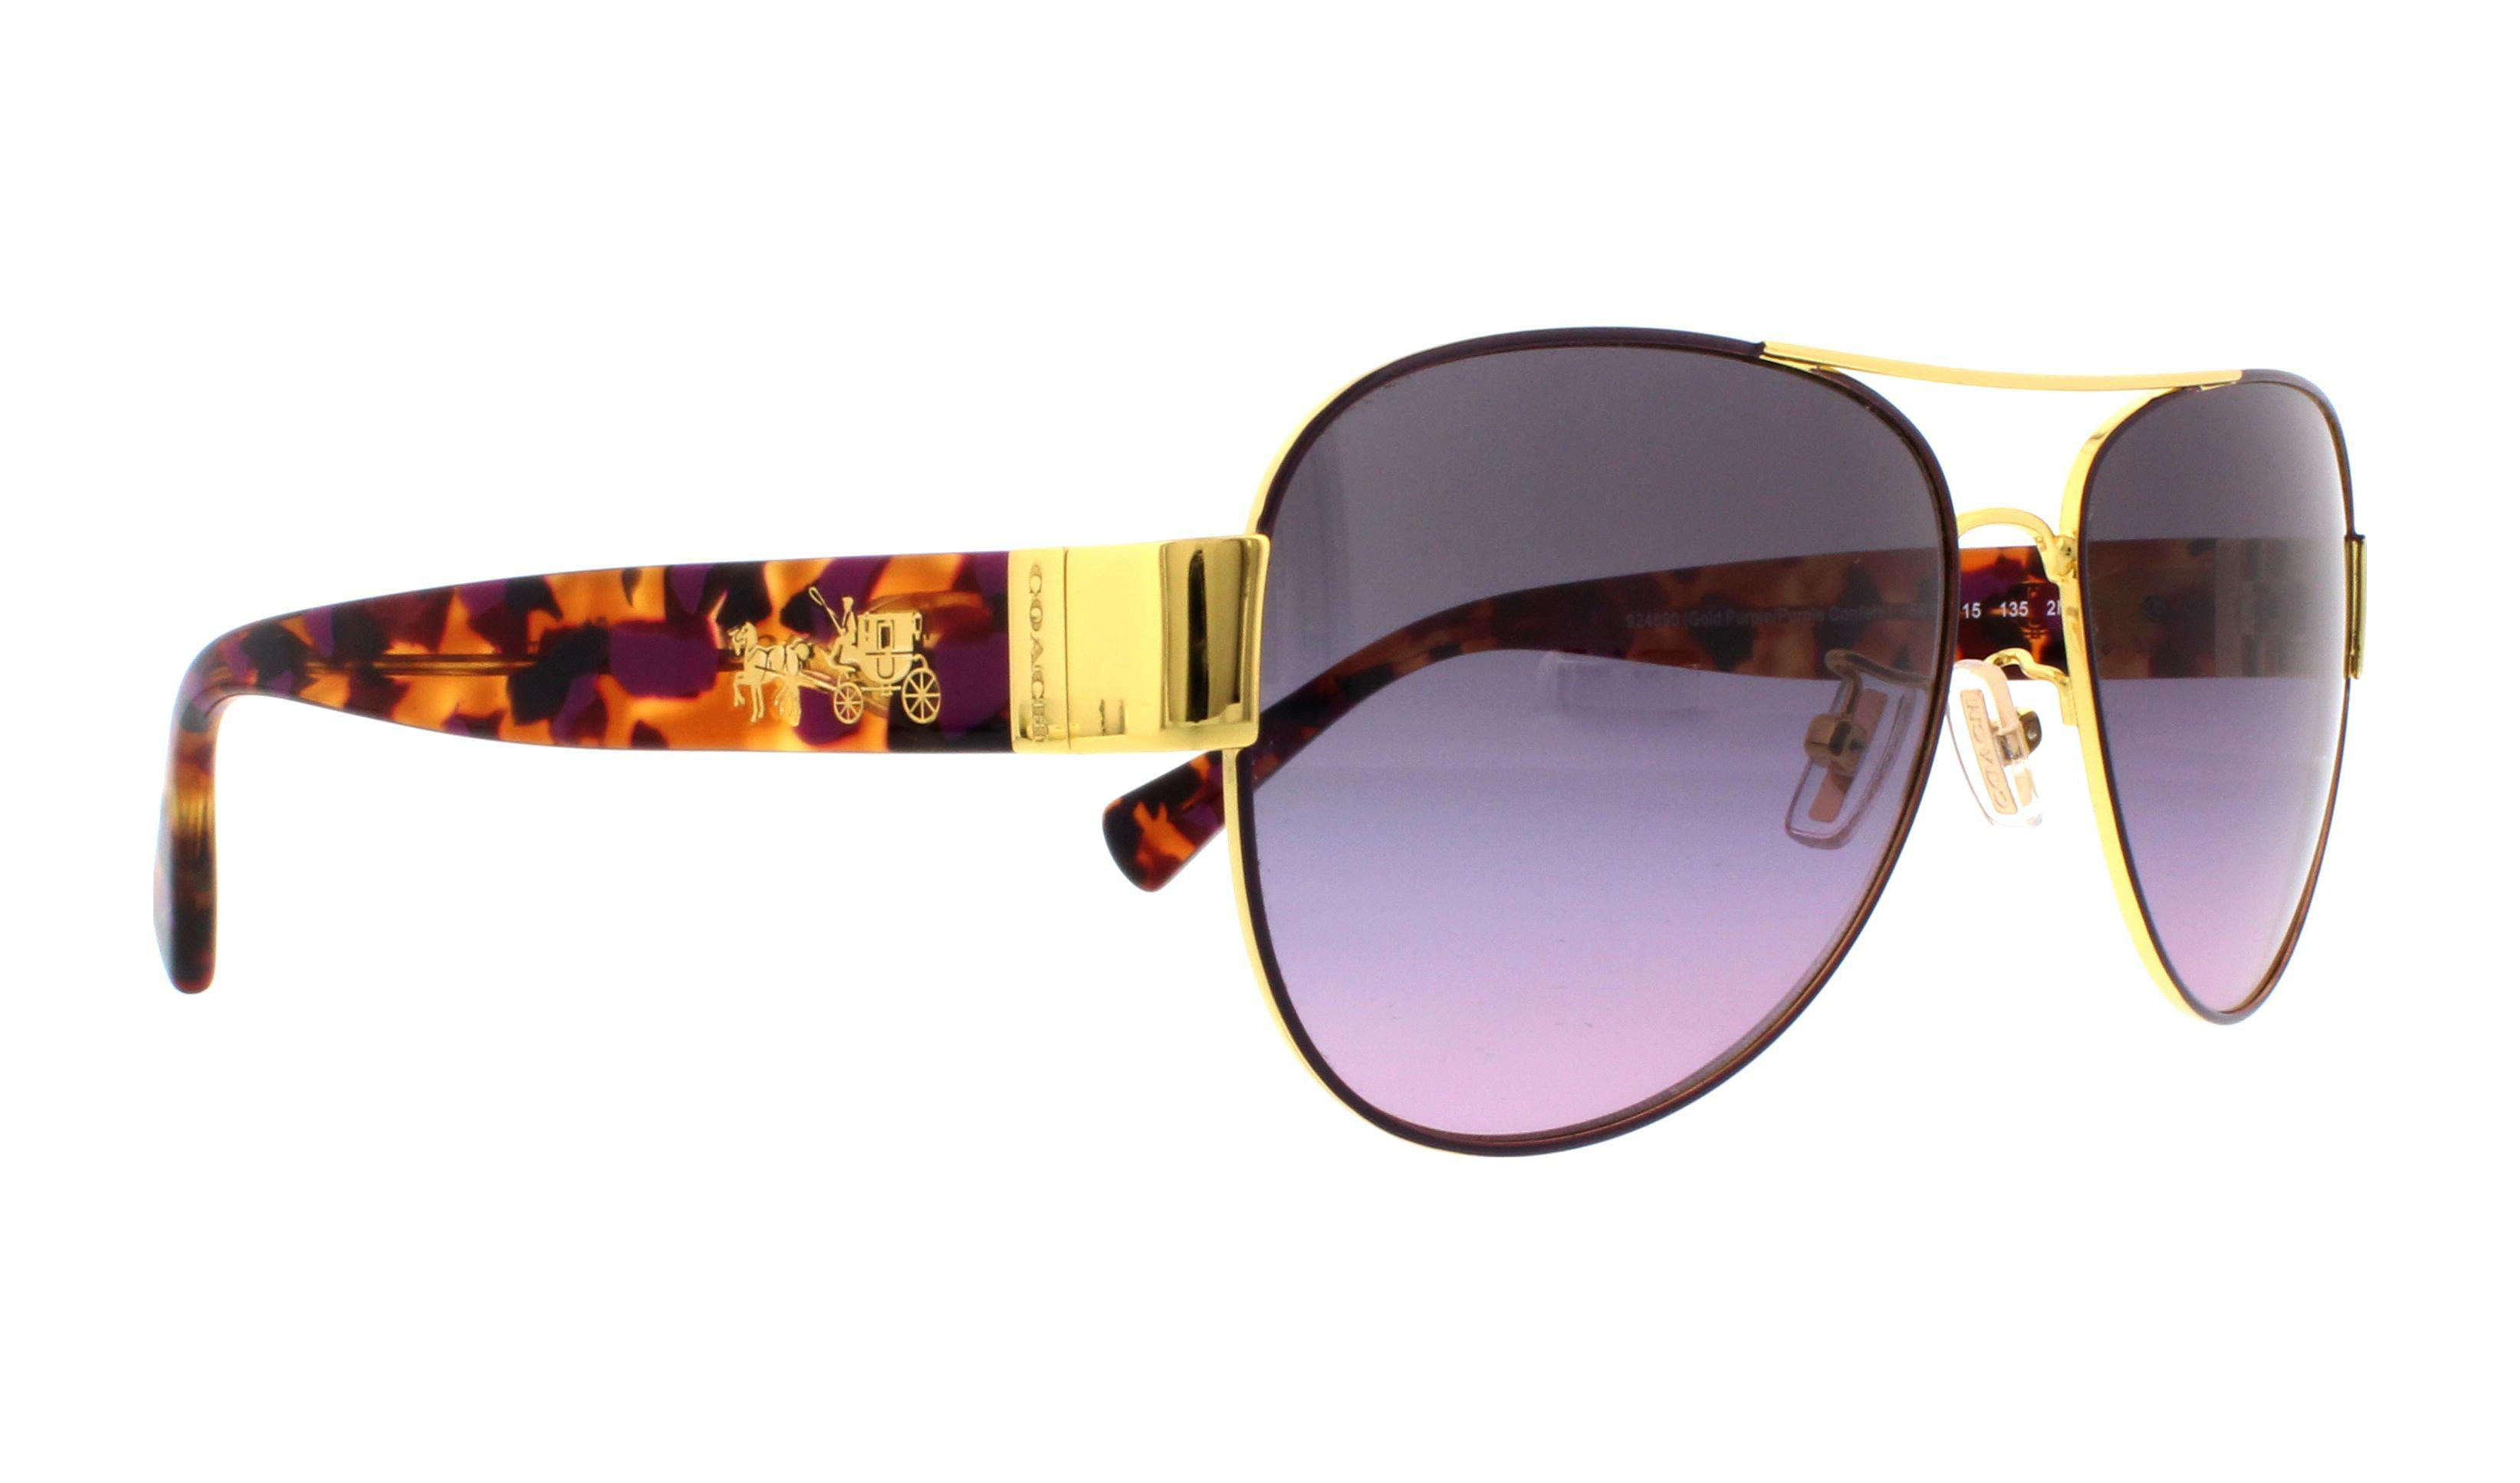 bbfd84929de9 ... switzerland coach sunglasses hc 7059 9238t5 gold dark tortoise 58mm  walmart bf769 a0f64